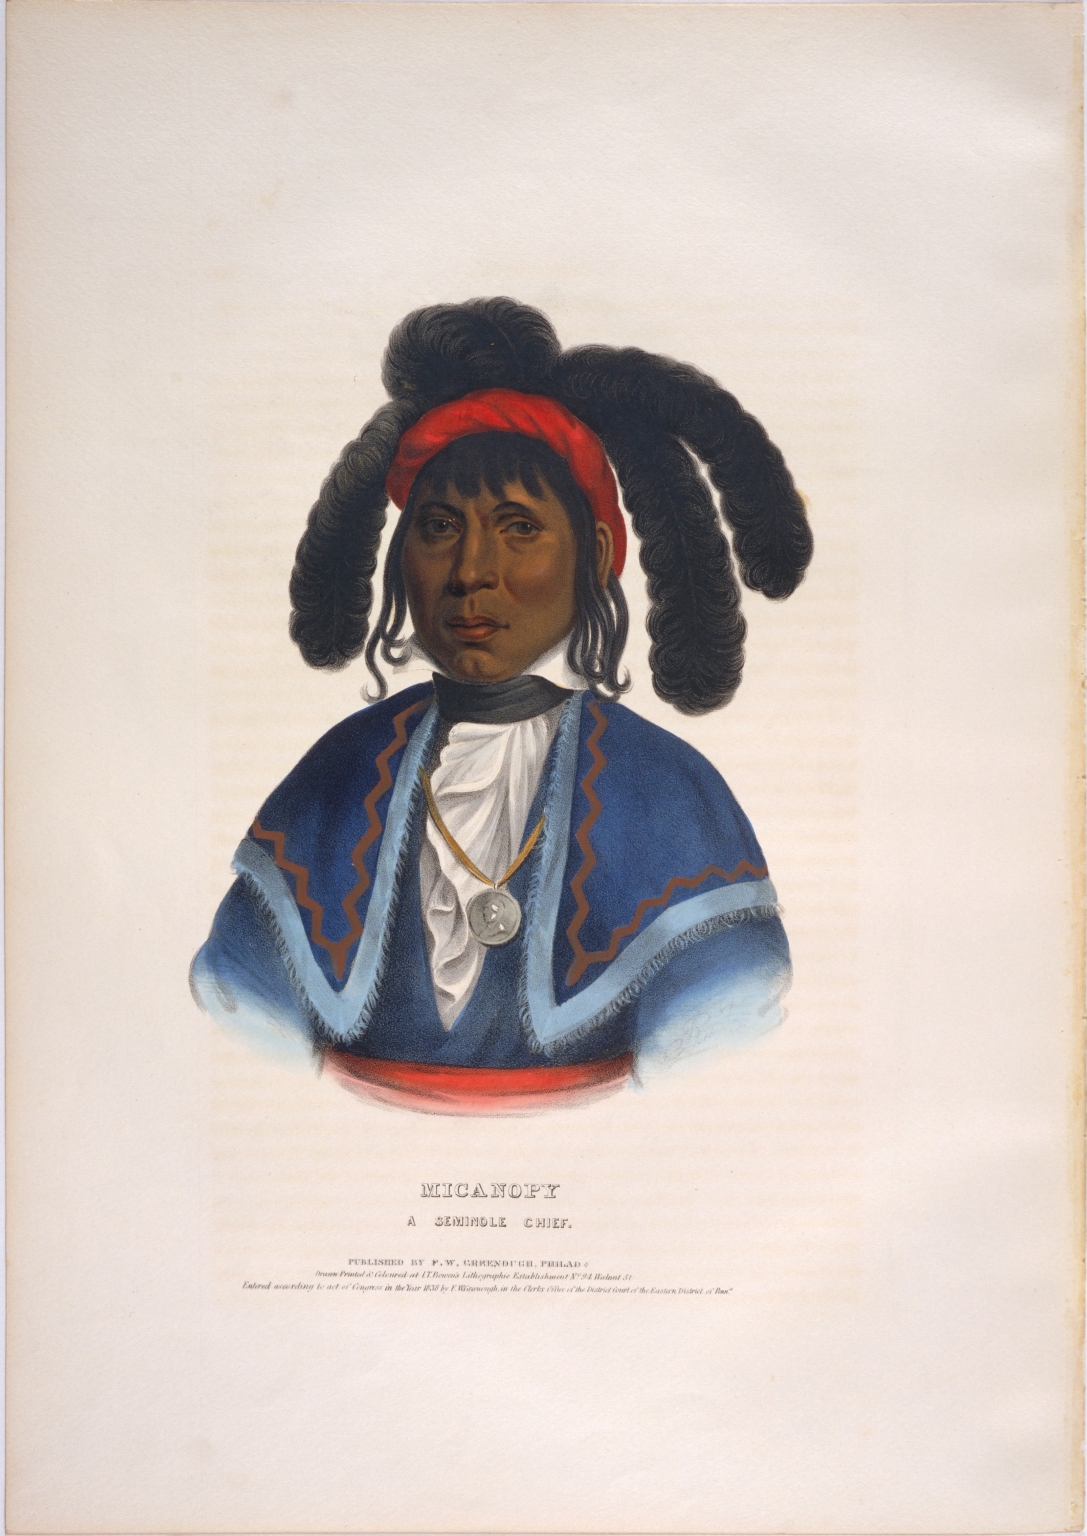 Micanopy, a Seminole chief